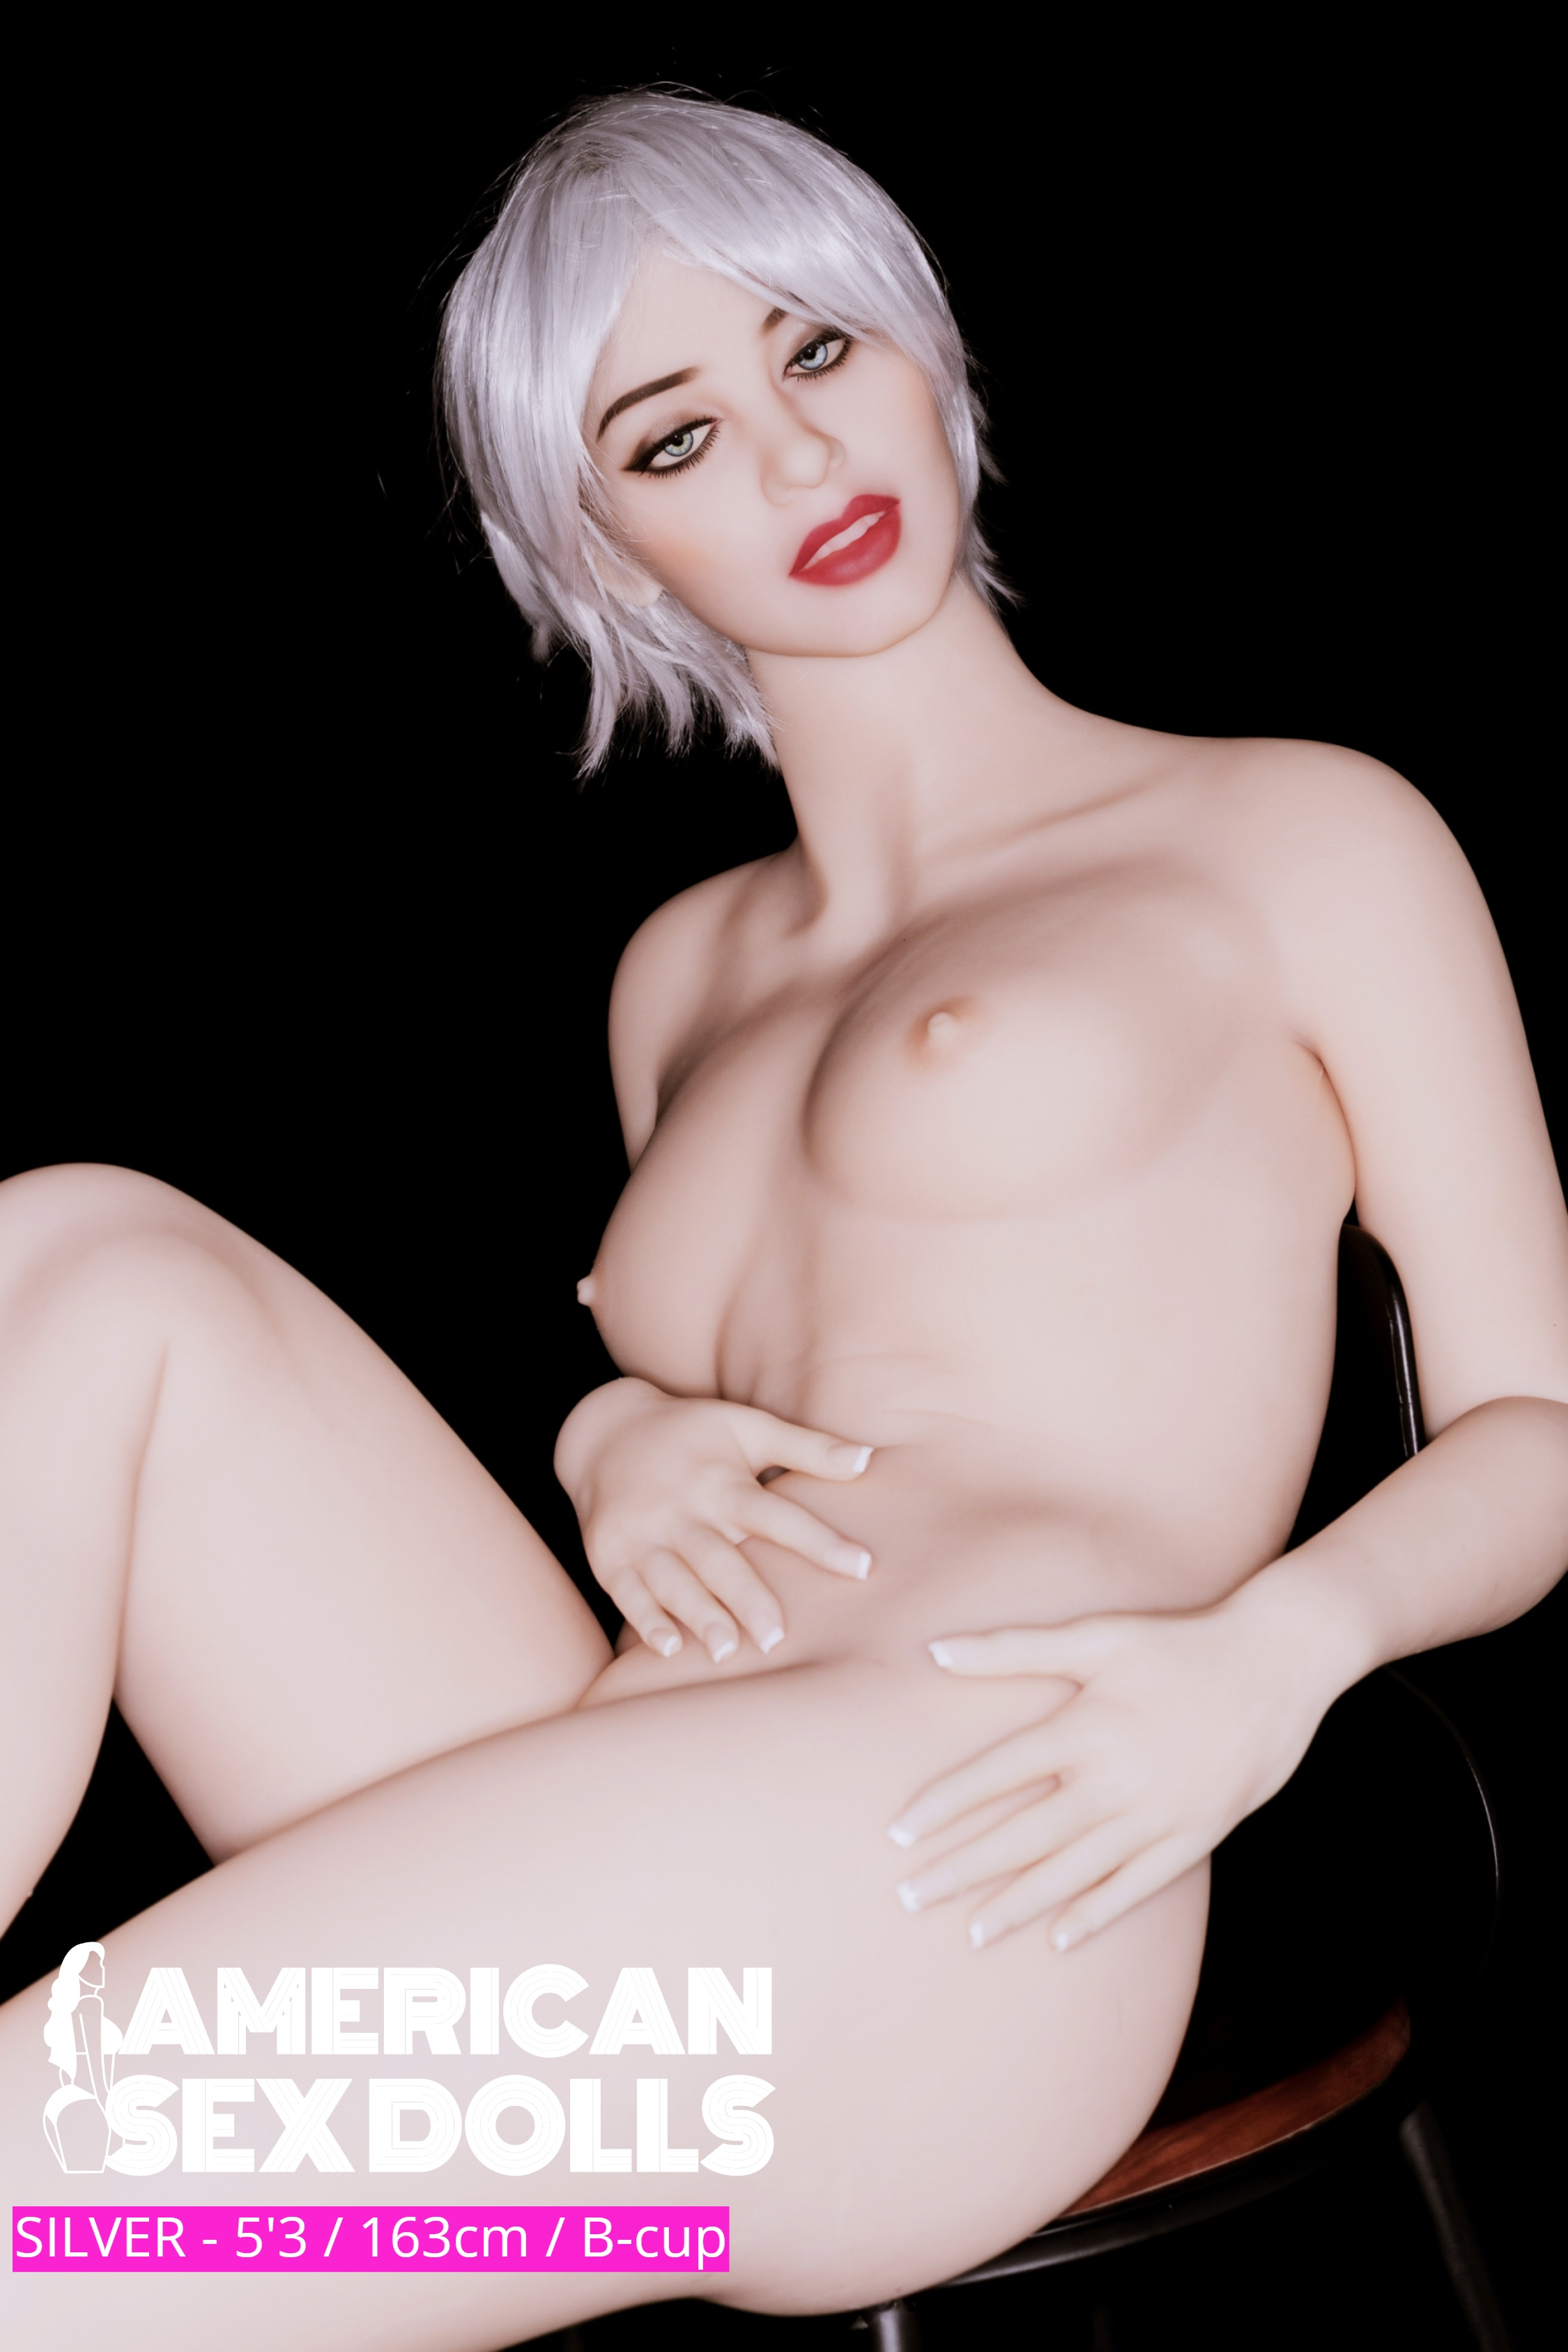 American Sex Doll WMDoll 162 Bcup 234 (11).jpg